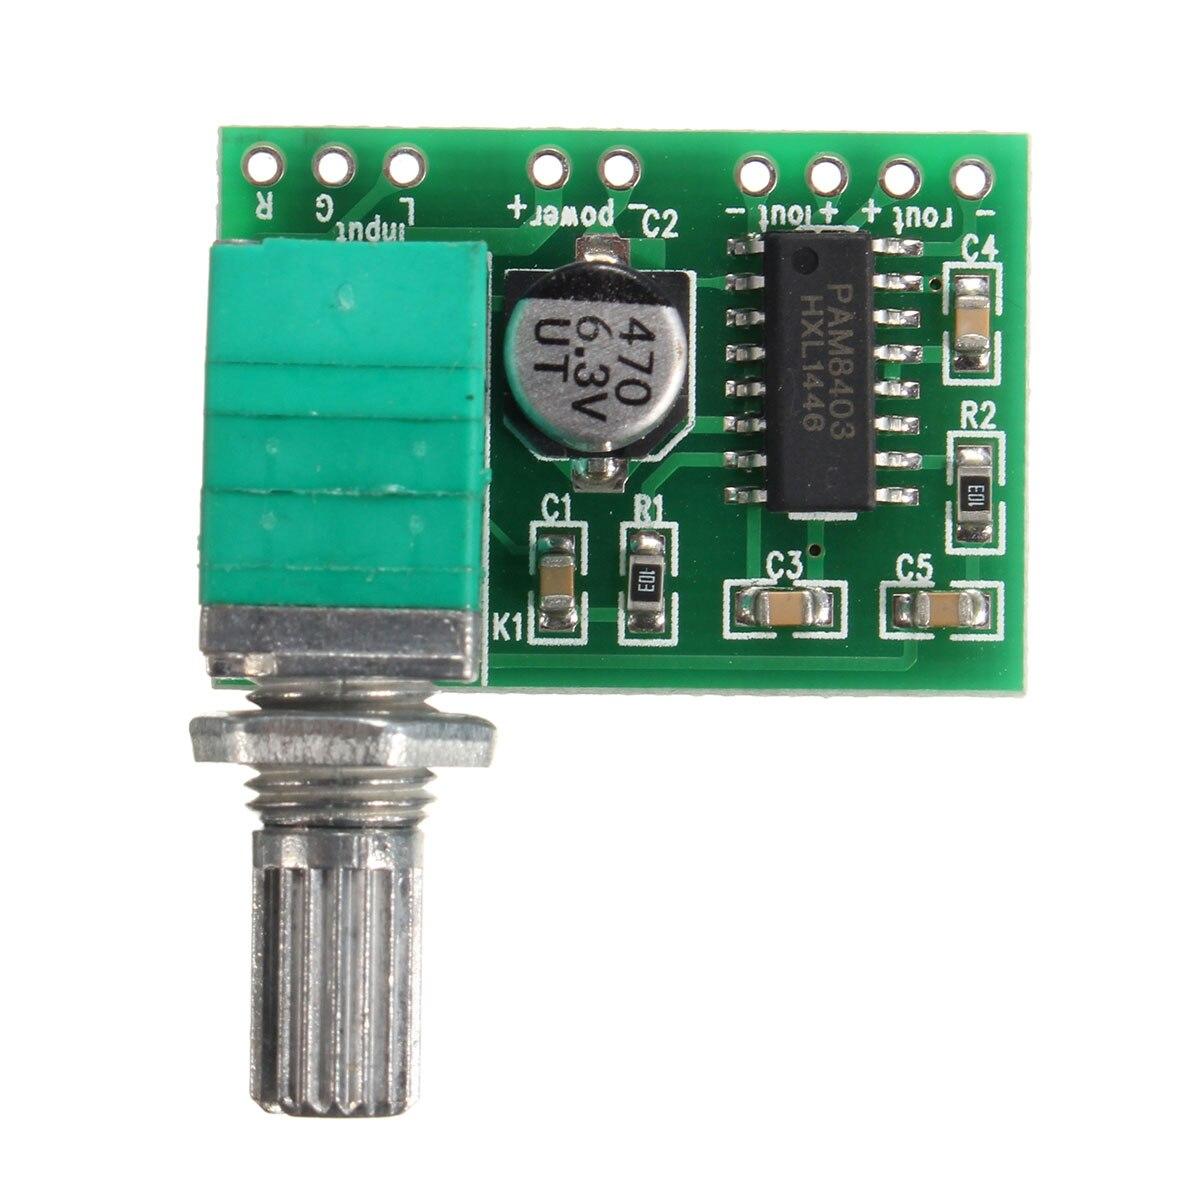 LEORY 2.5V-5.5V PAM8403 2 Channel USB Power Audio Digital Amplifier Module Board Efficient 3Wx2 Volume Control